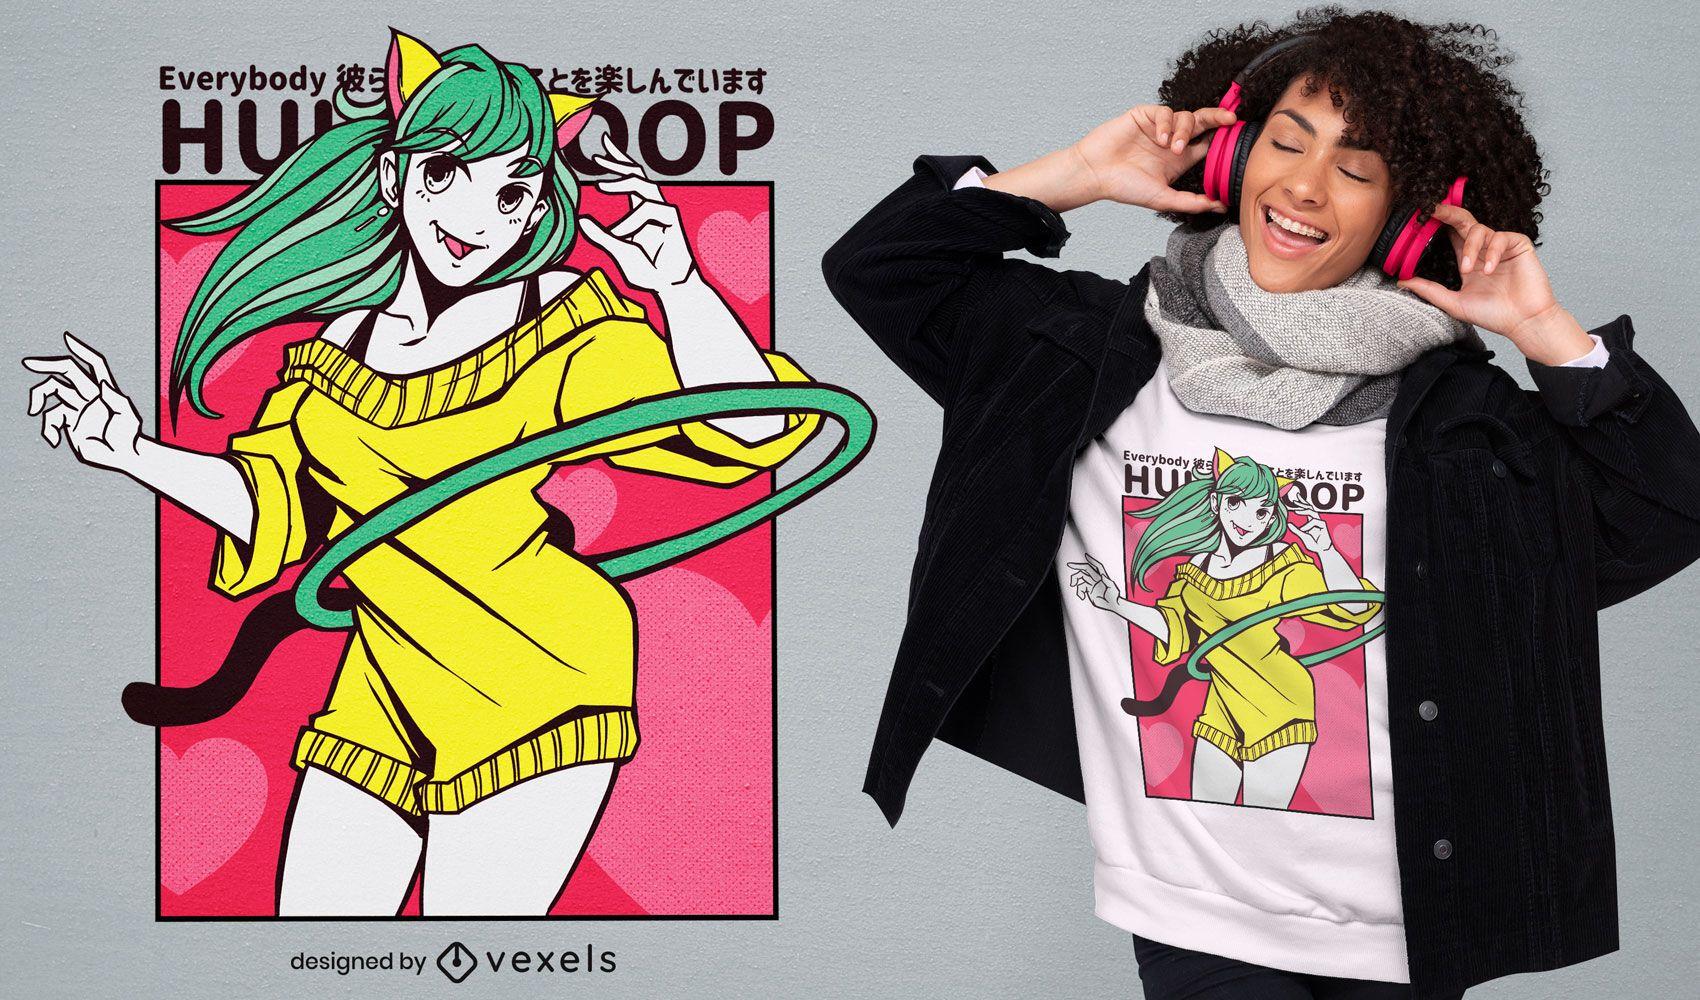 Hula hoop anime girl t-shirt design